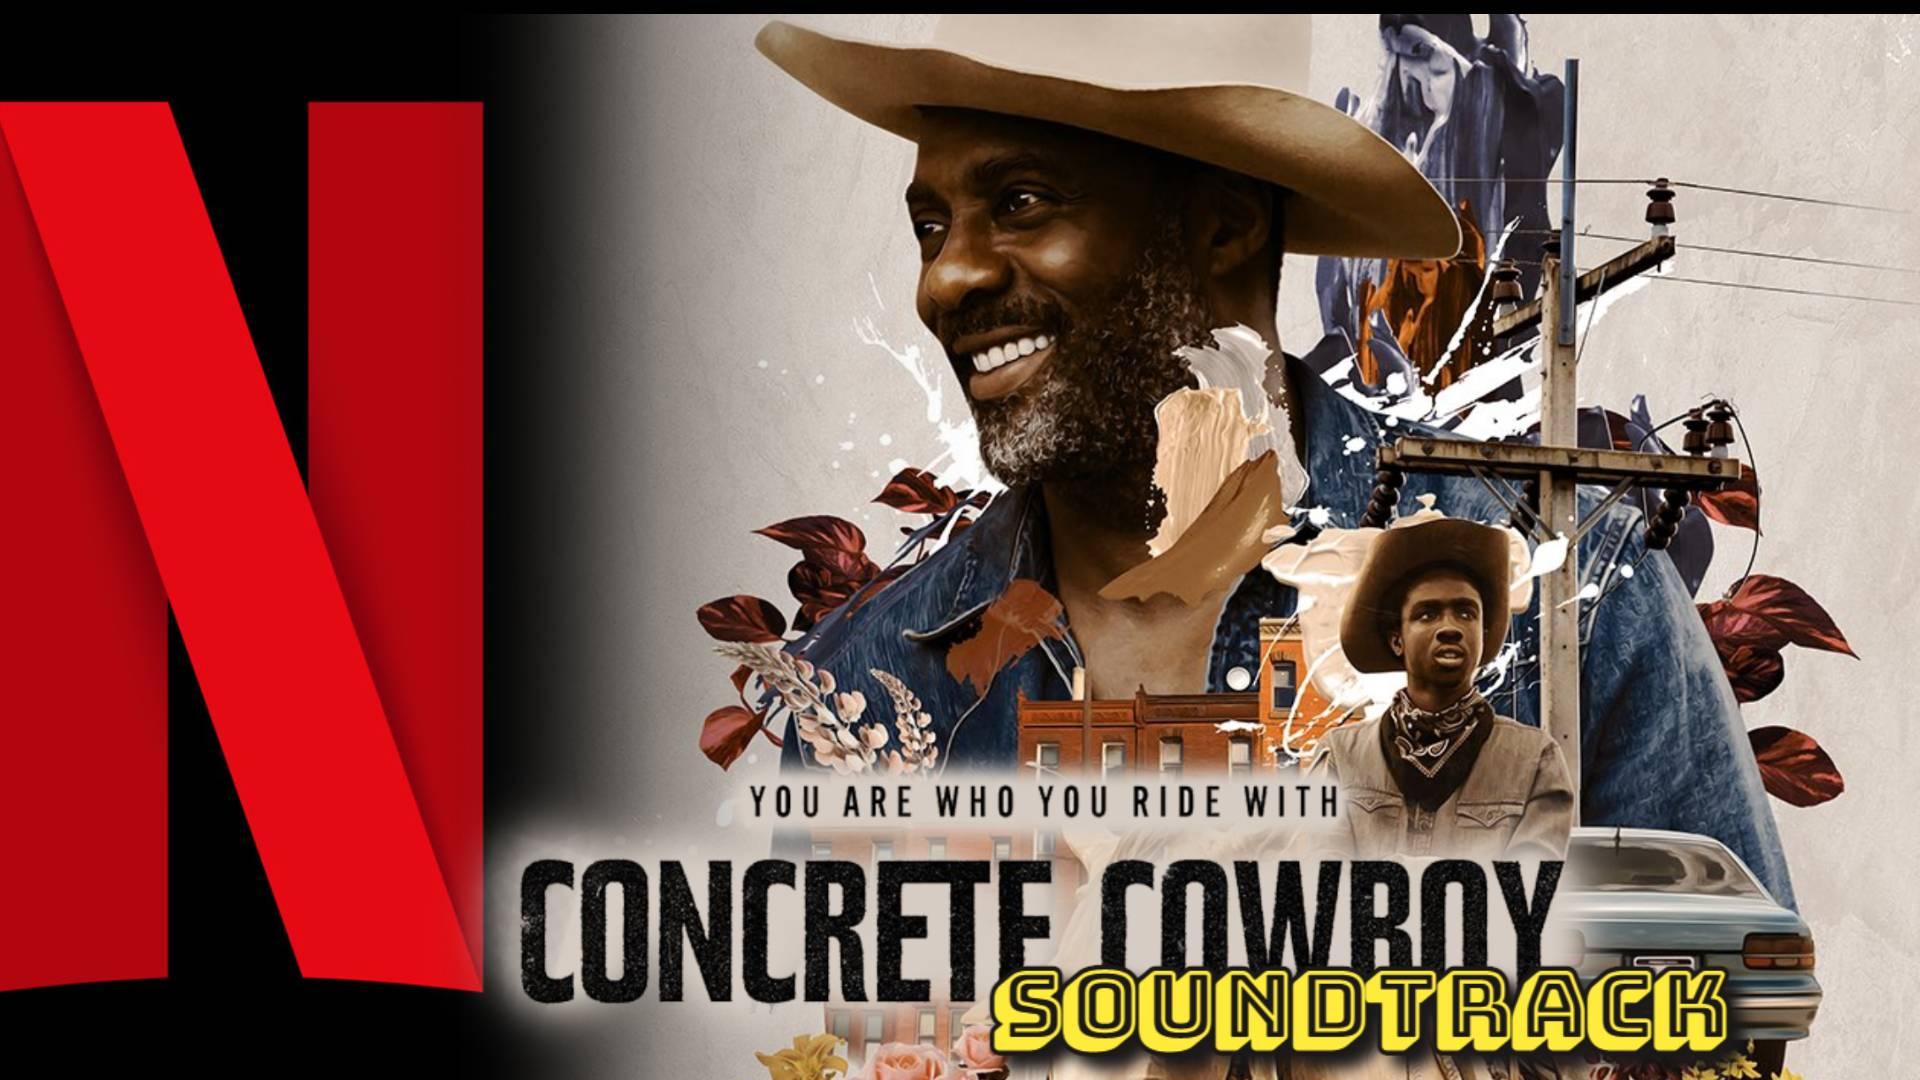 Concrete Cowboy o Baqueros del Concreto SOUNDTRACK